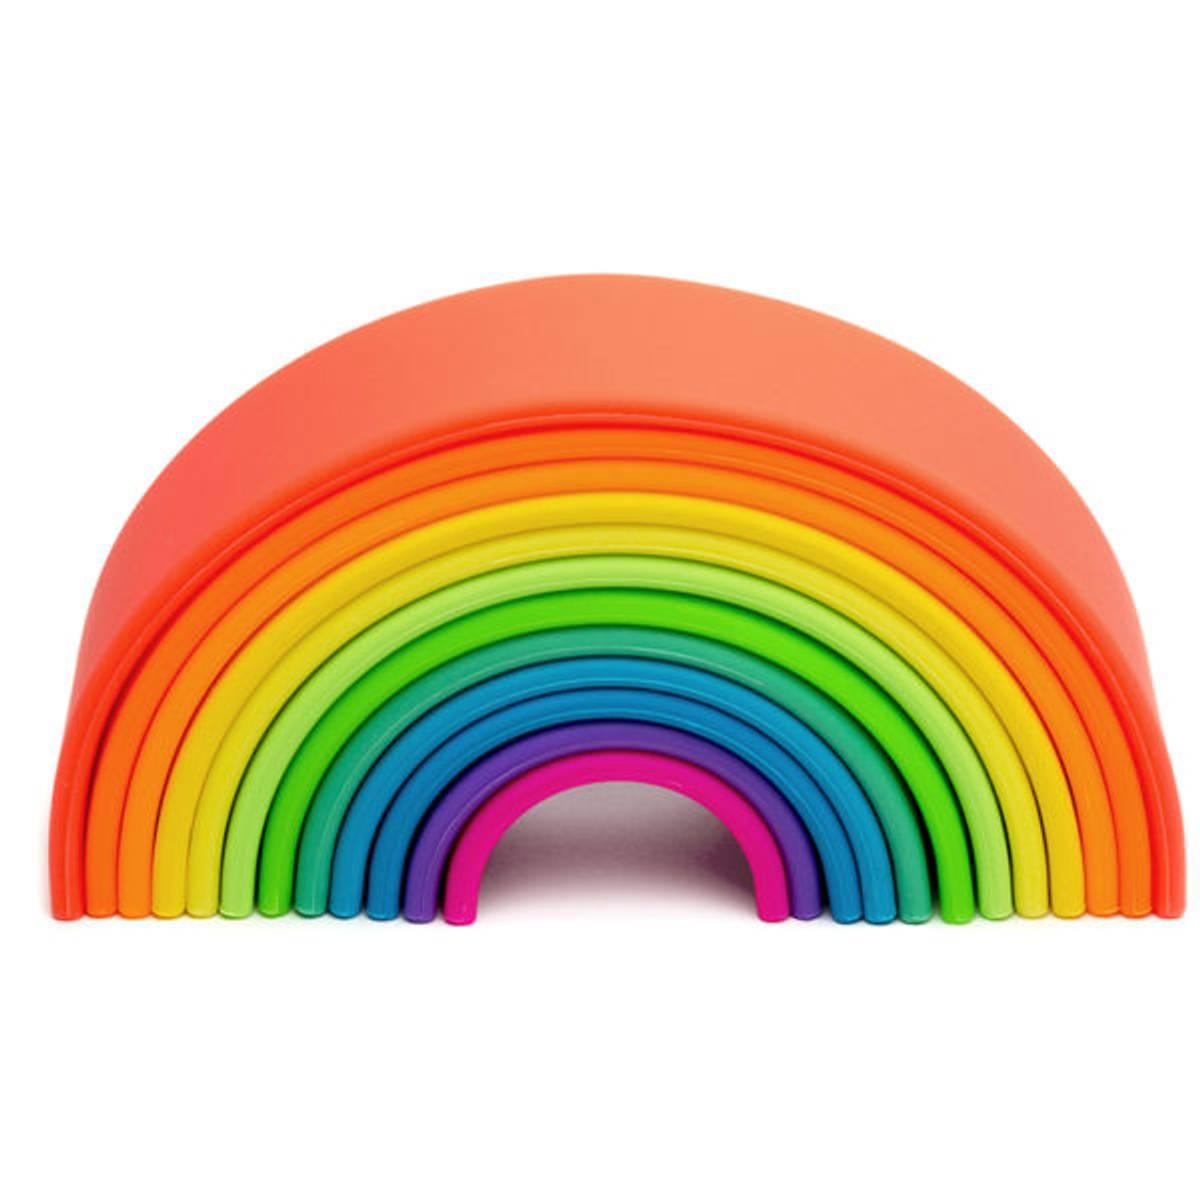 Stor regnbue, Klare farger - leker i silikon / Dëna Toys